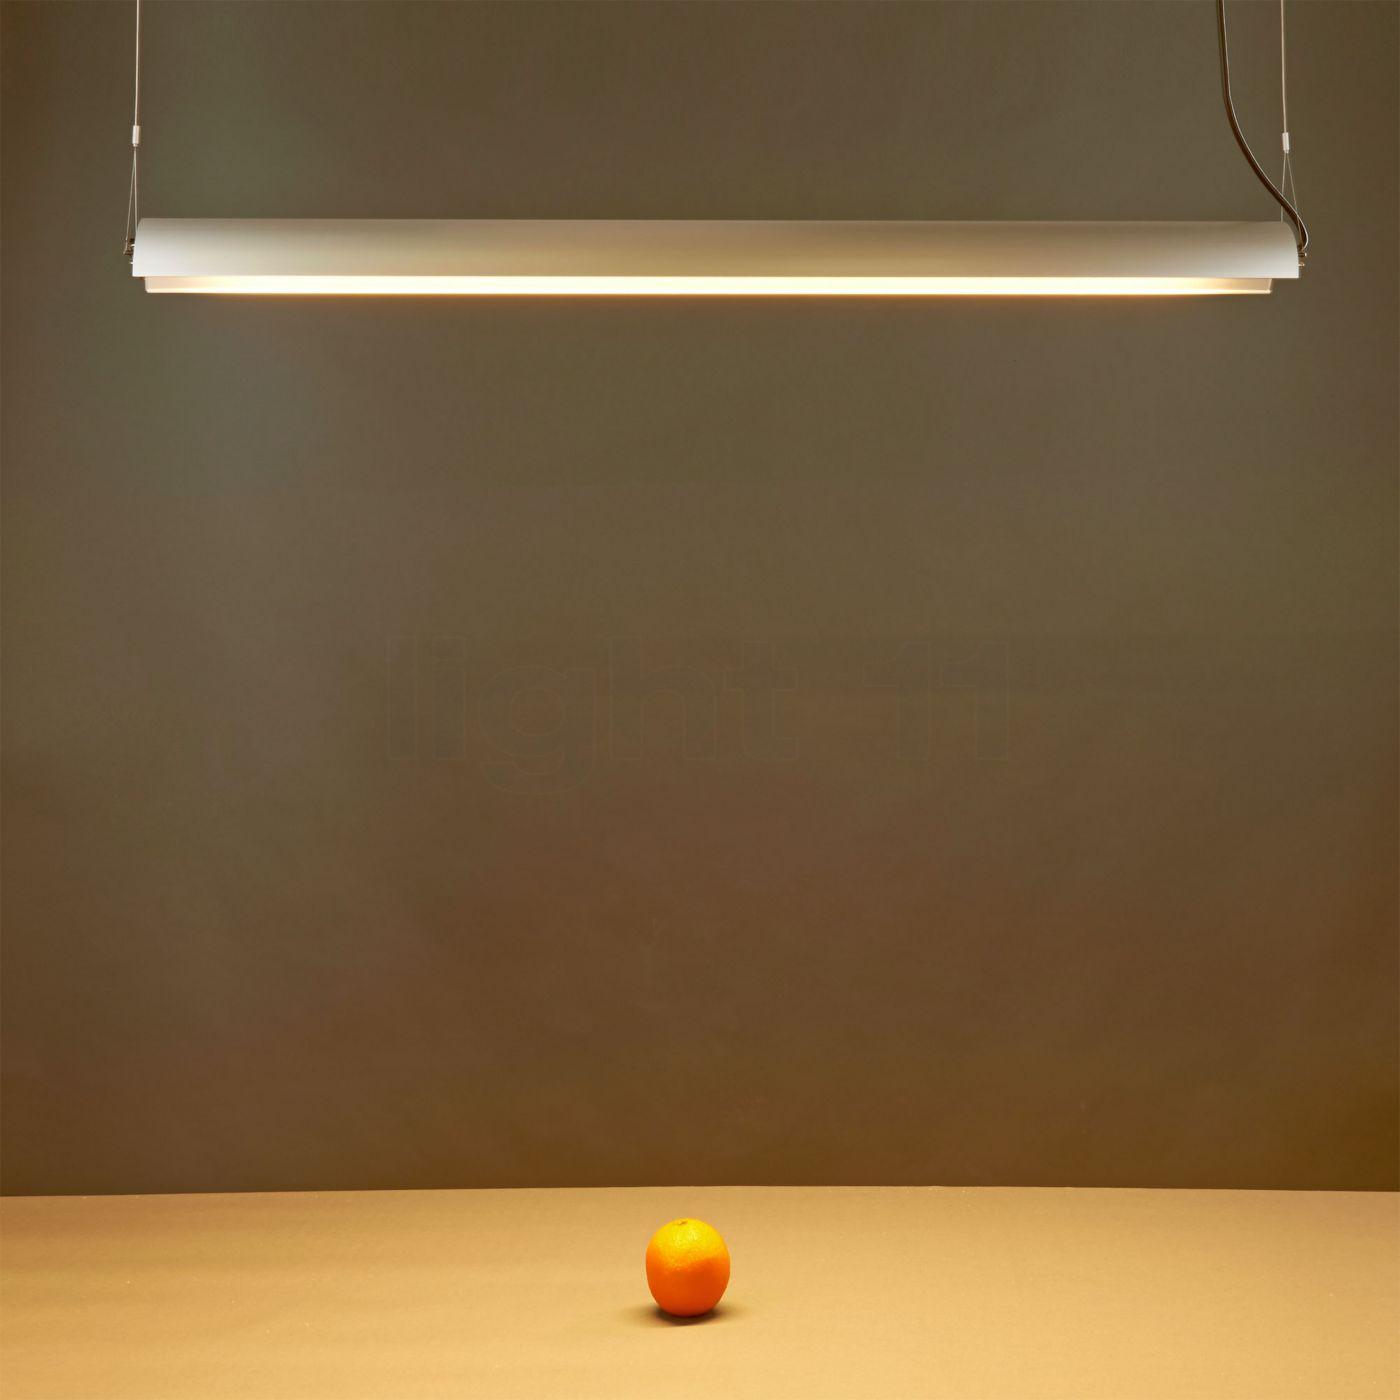 Belux_UpDown_02___58W--2000665500004_10_u Faszinierend Up Down Lampe Dekorationen